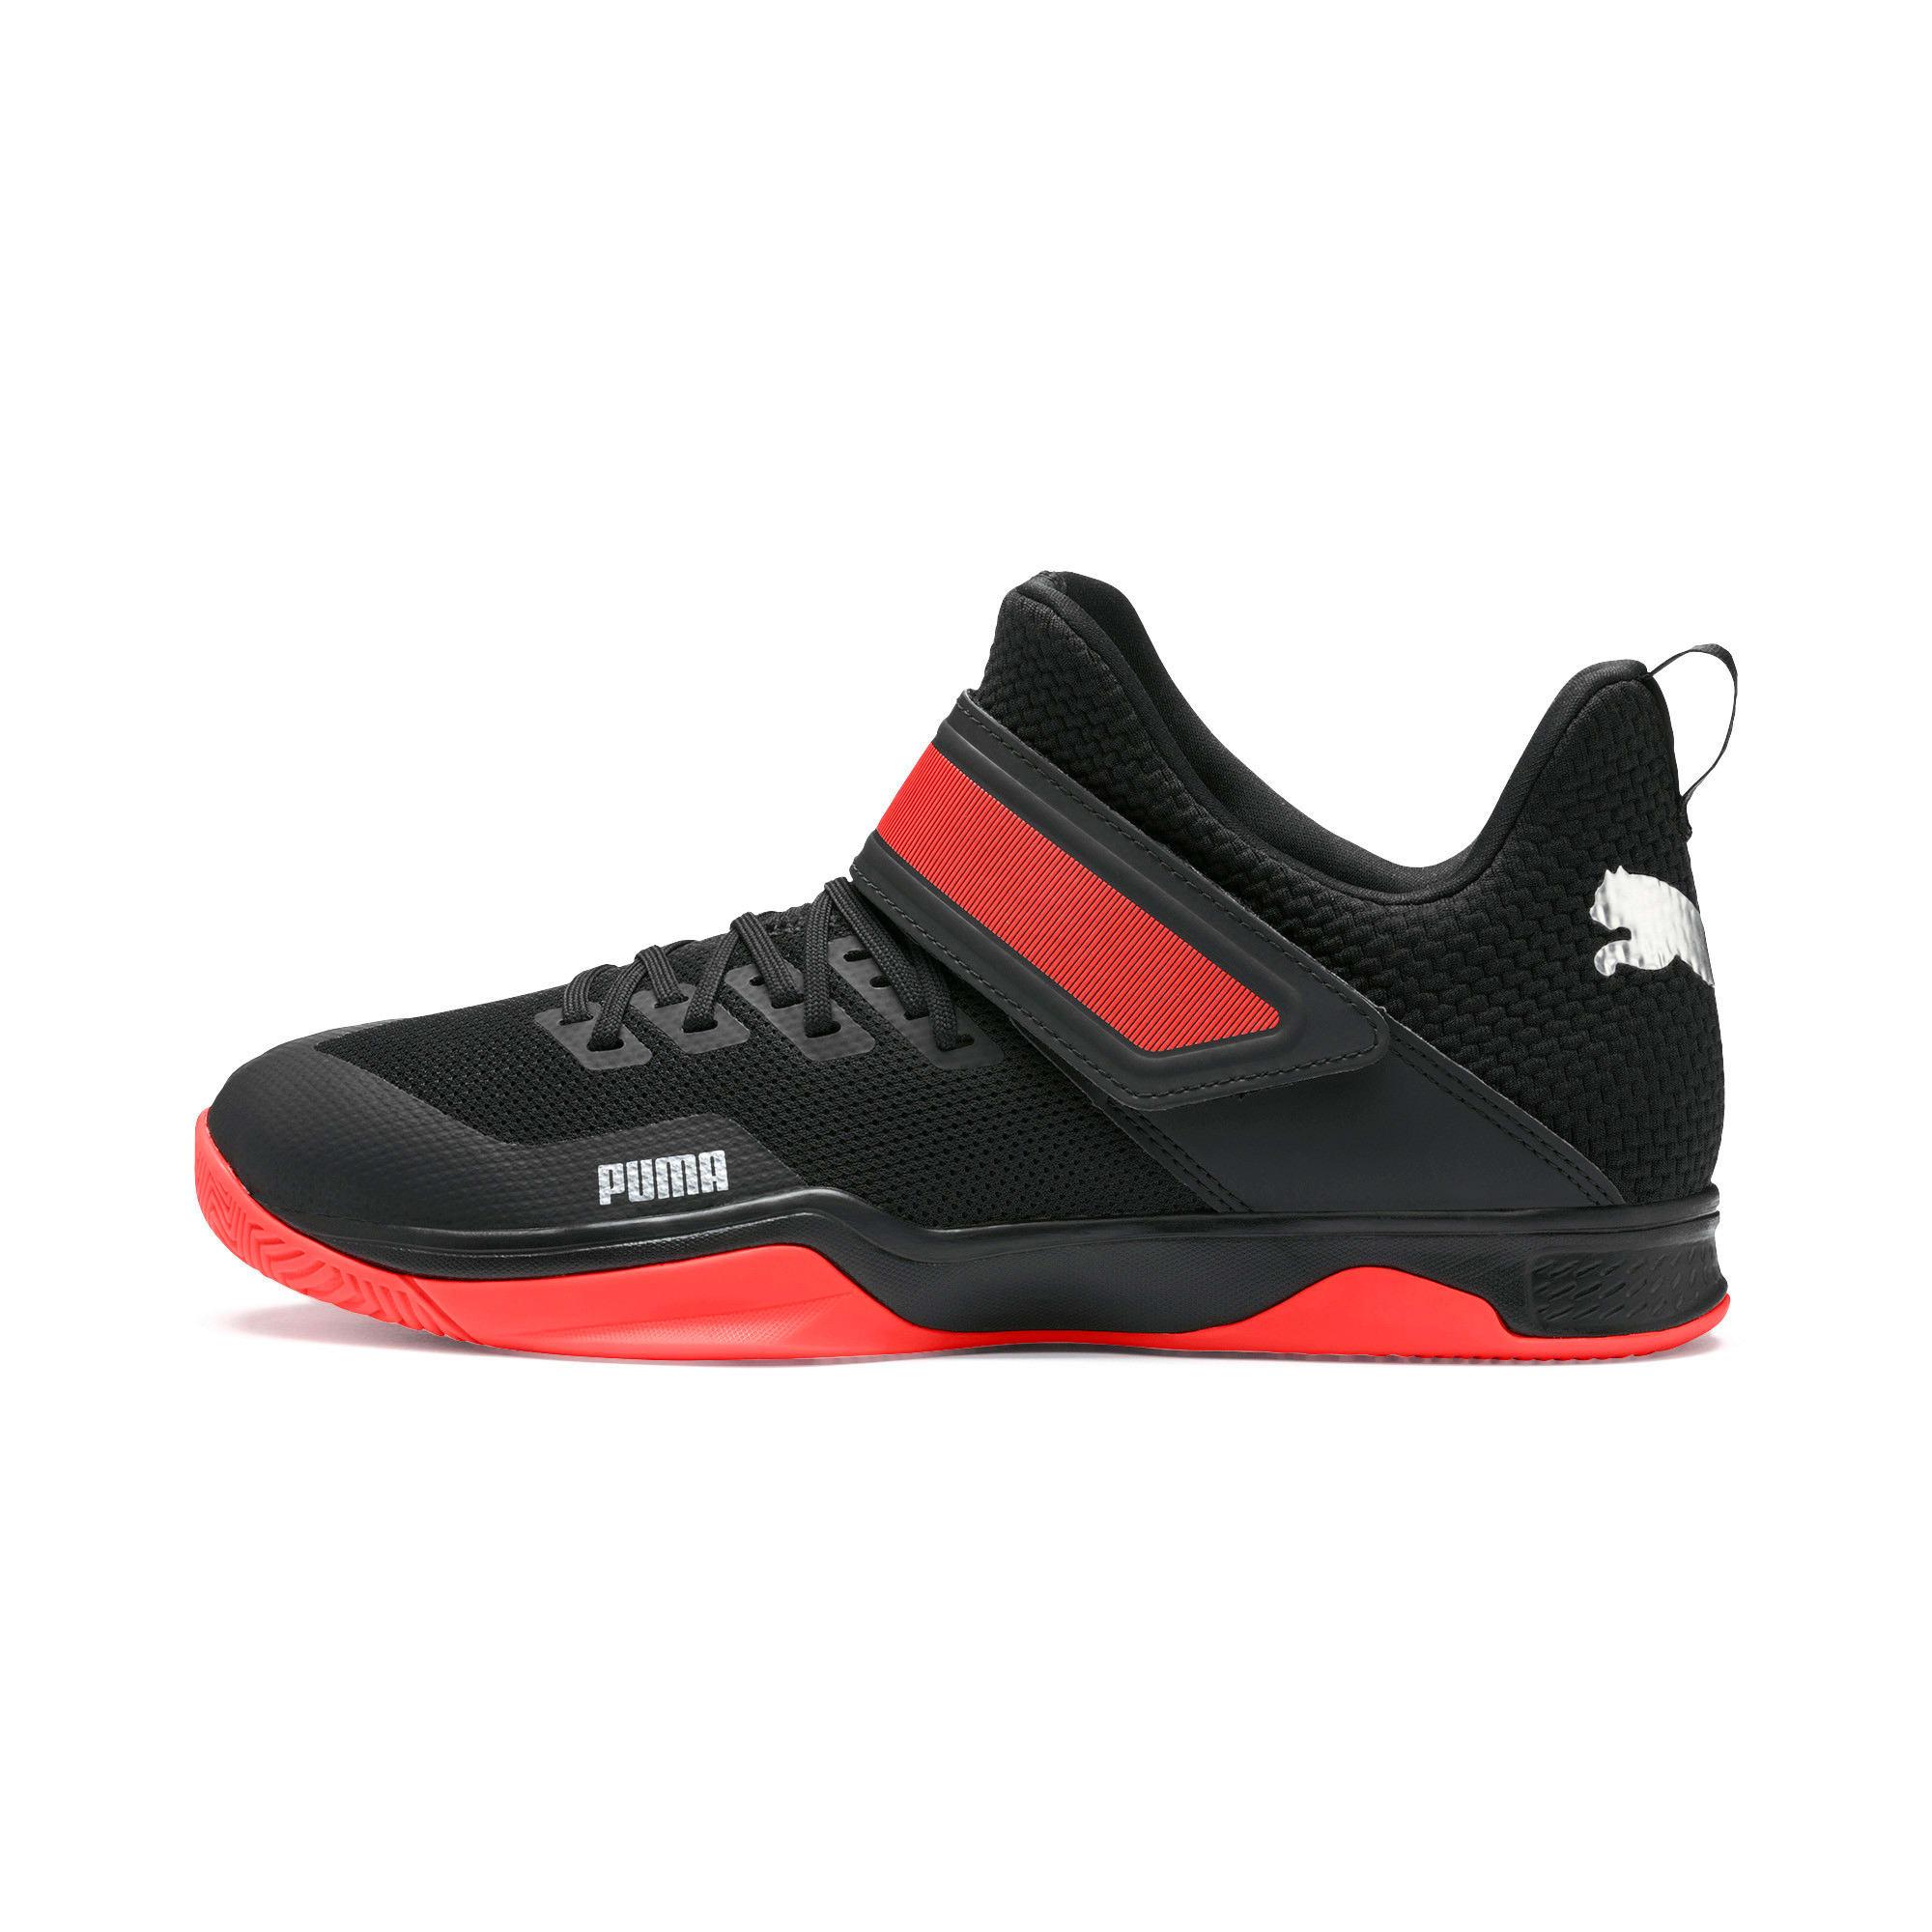 Thumbnail 1 of Chaussures Handball Rise XT3, Puma Black-Silver-Nrgy Red, medium